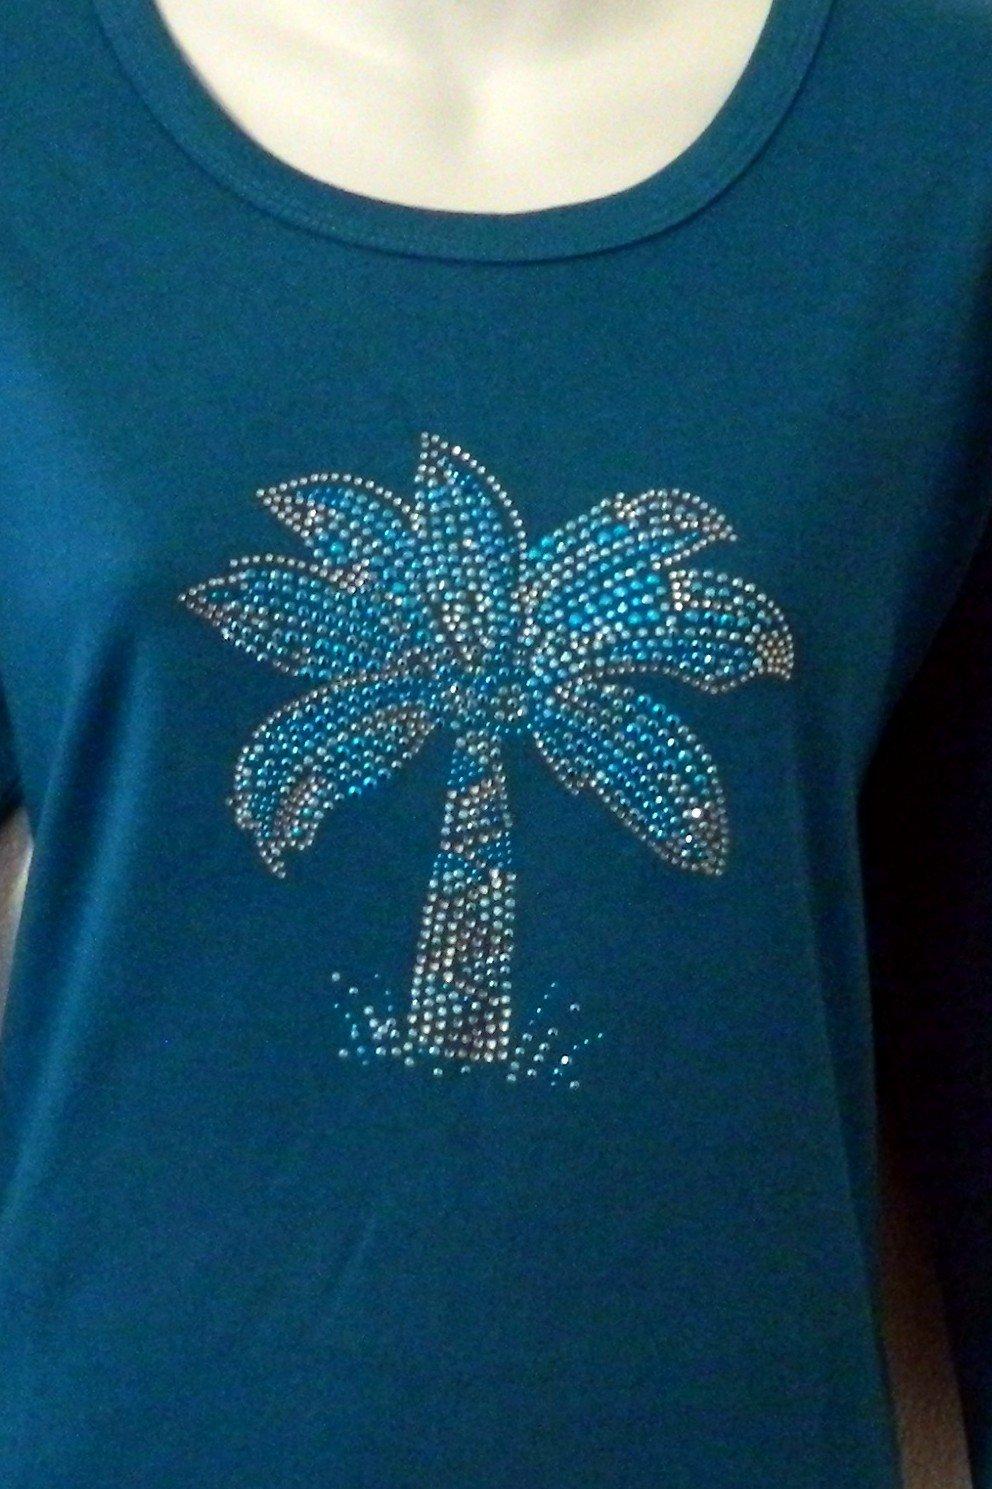 Palm Tree design -  Aqua on Teal